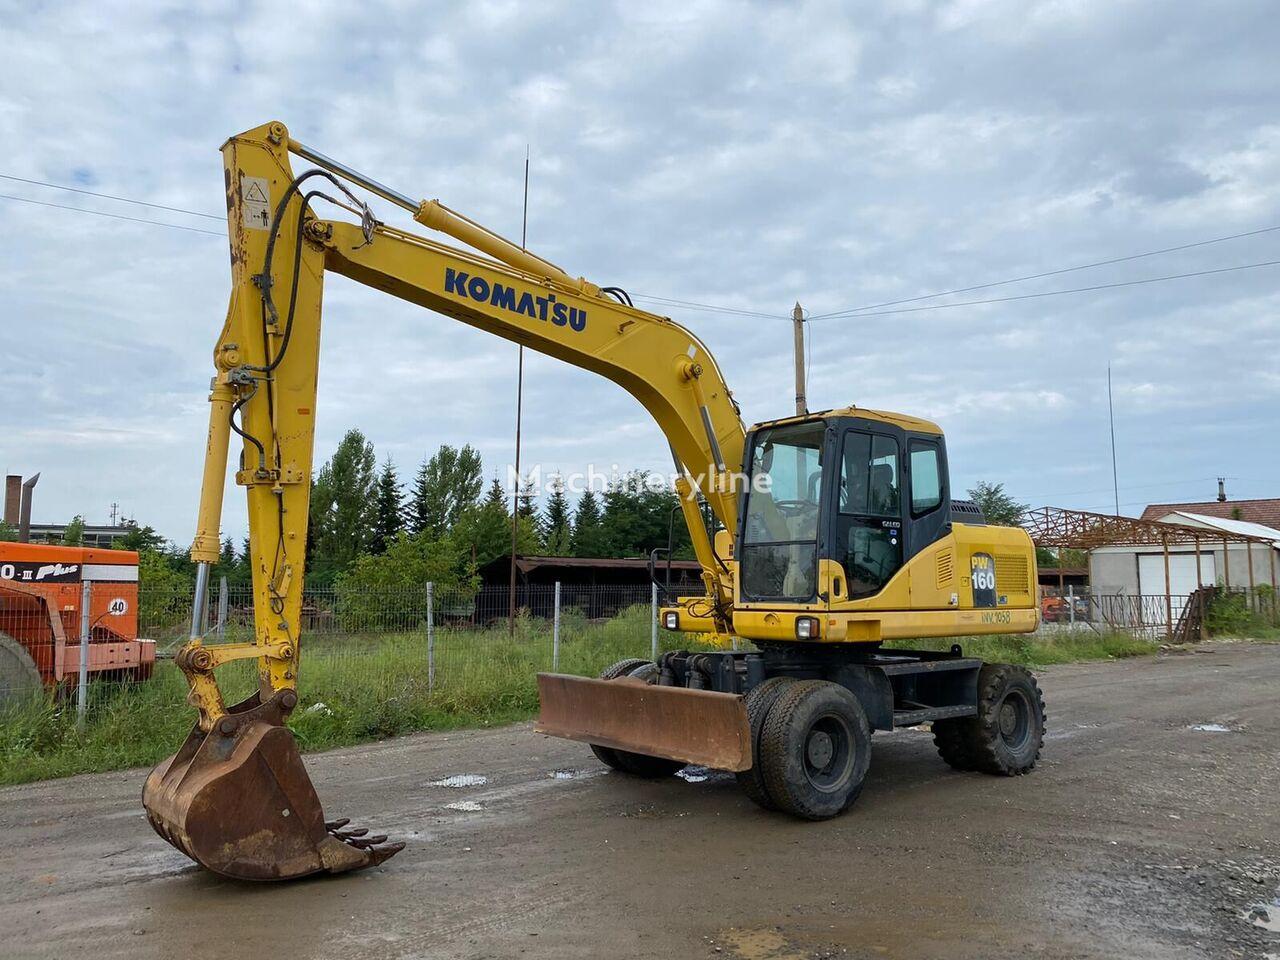 KOMATSU PW160 wheel excavator